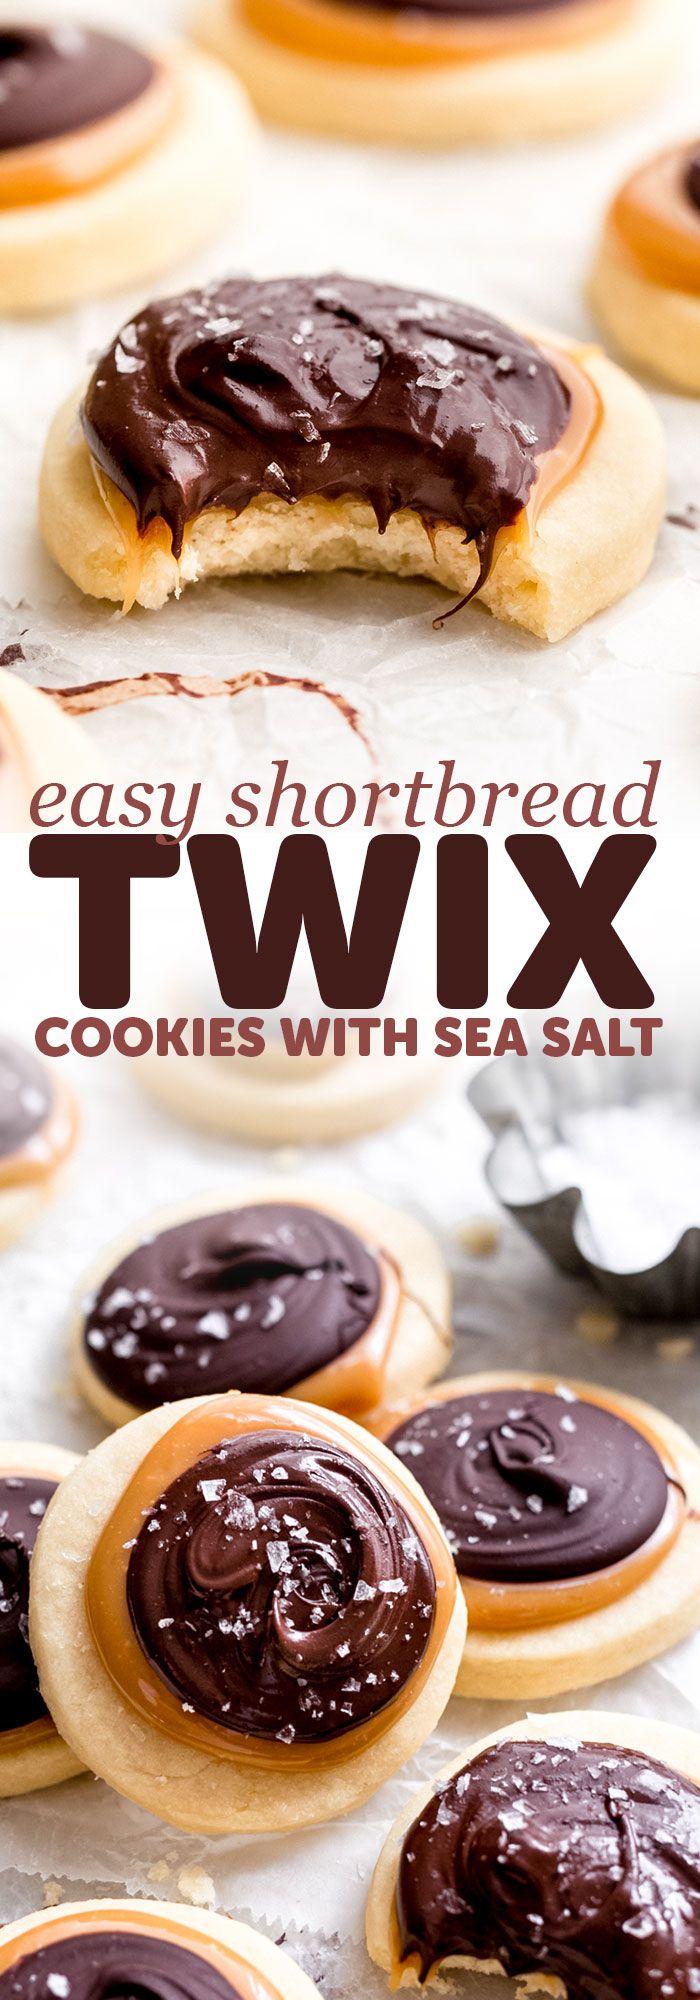 Easy Shortbread Twix Cookies Recipe | Little Spice Jar #twixcookies